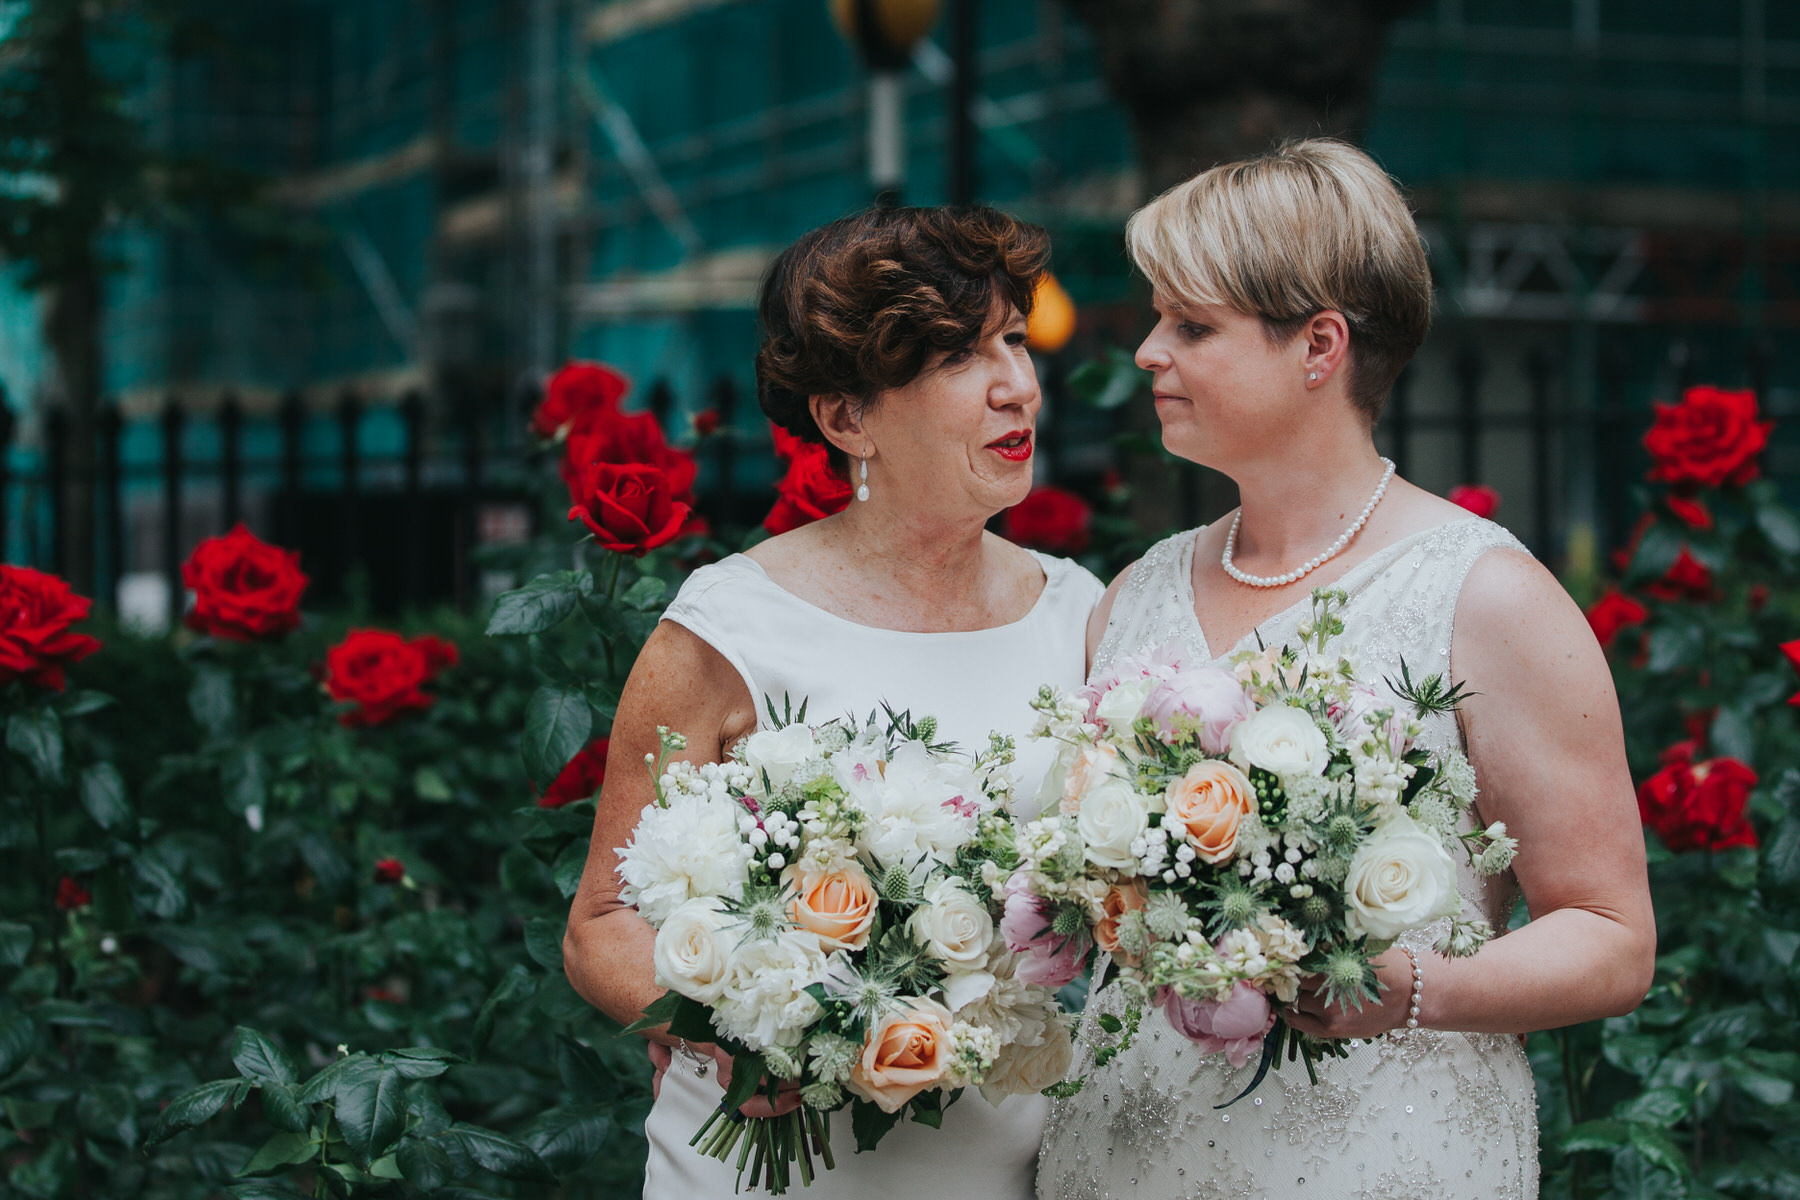 153 two brides wedding portraits London park.jpg